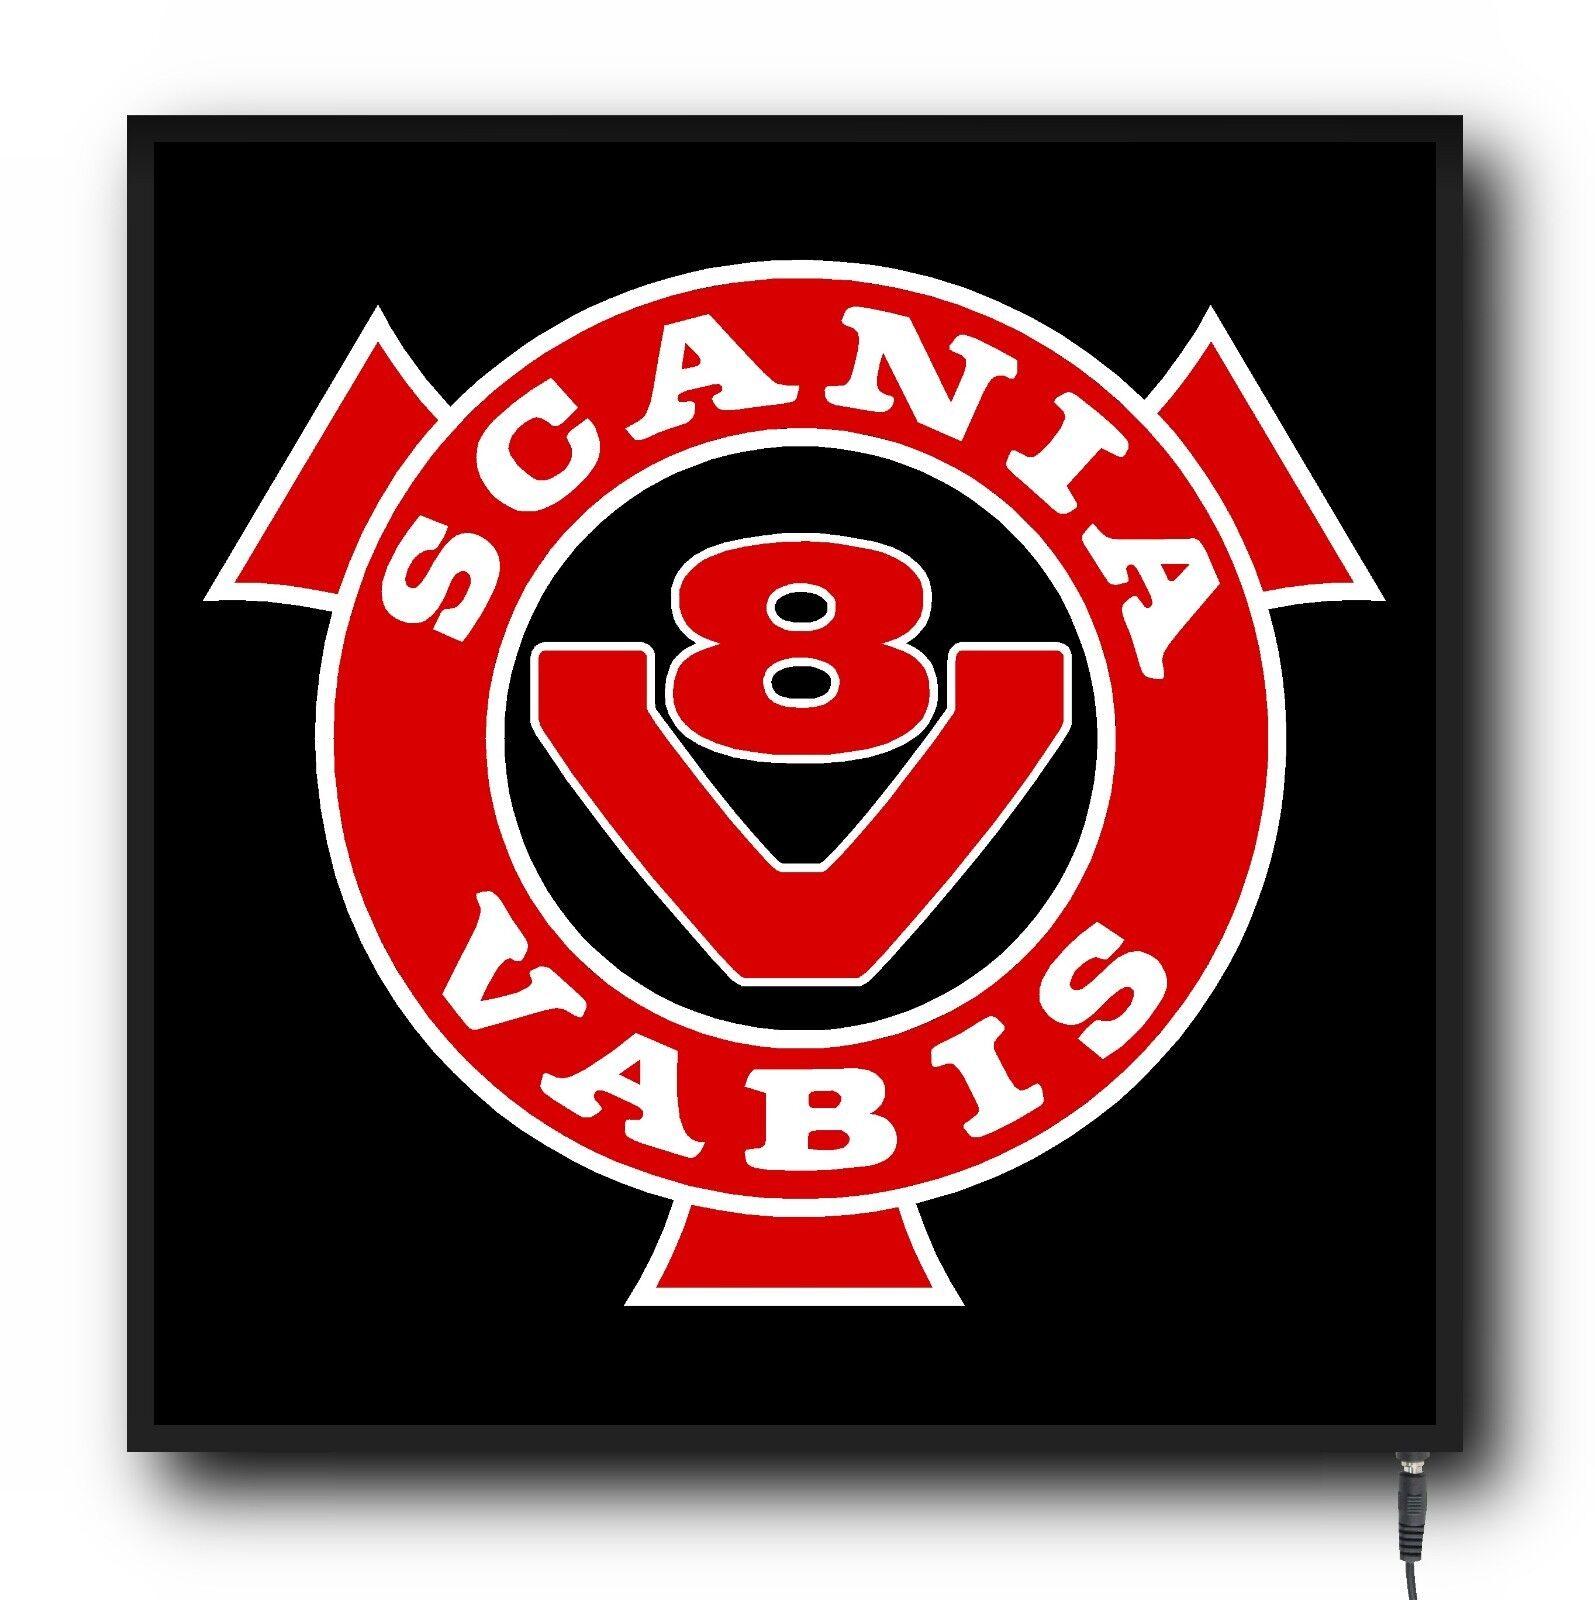 24 V Cabin Interior Del Light Plate Scania Vabis V8 Logo